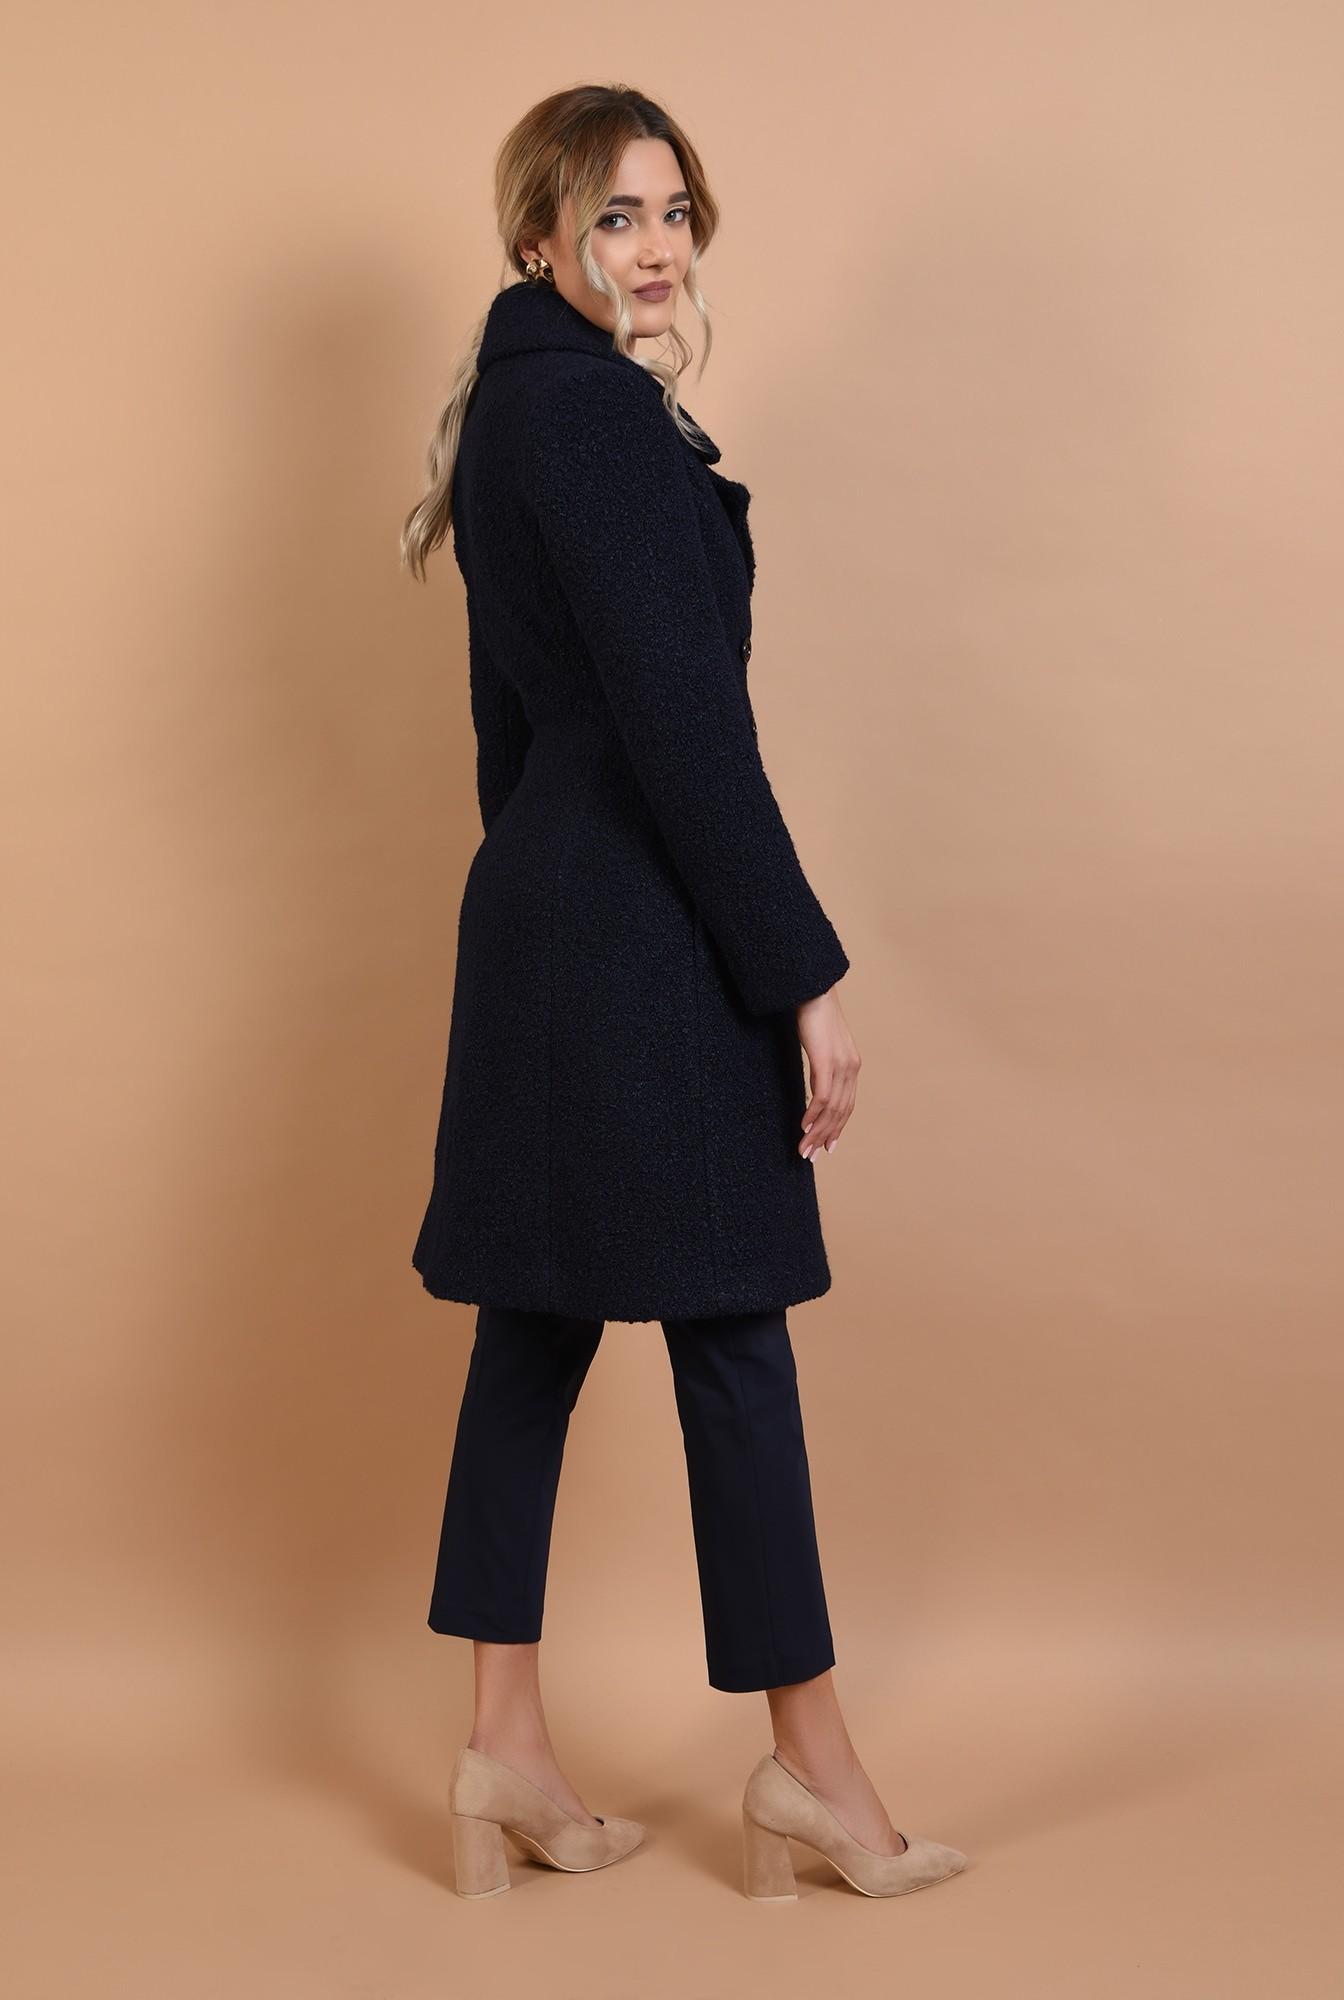 1 - palton bleumarin, cu nasturi, revere crestate, anchior petrecut